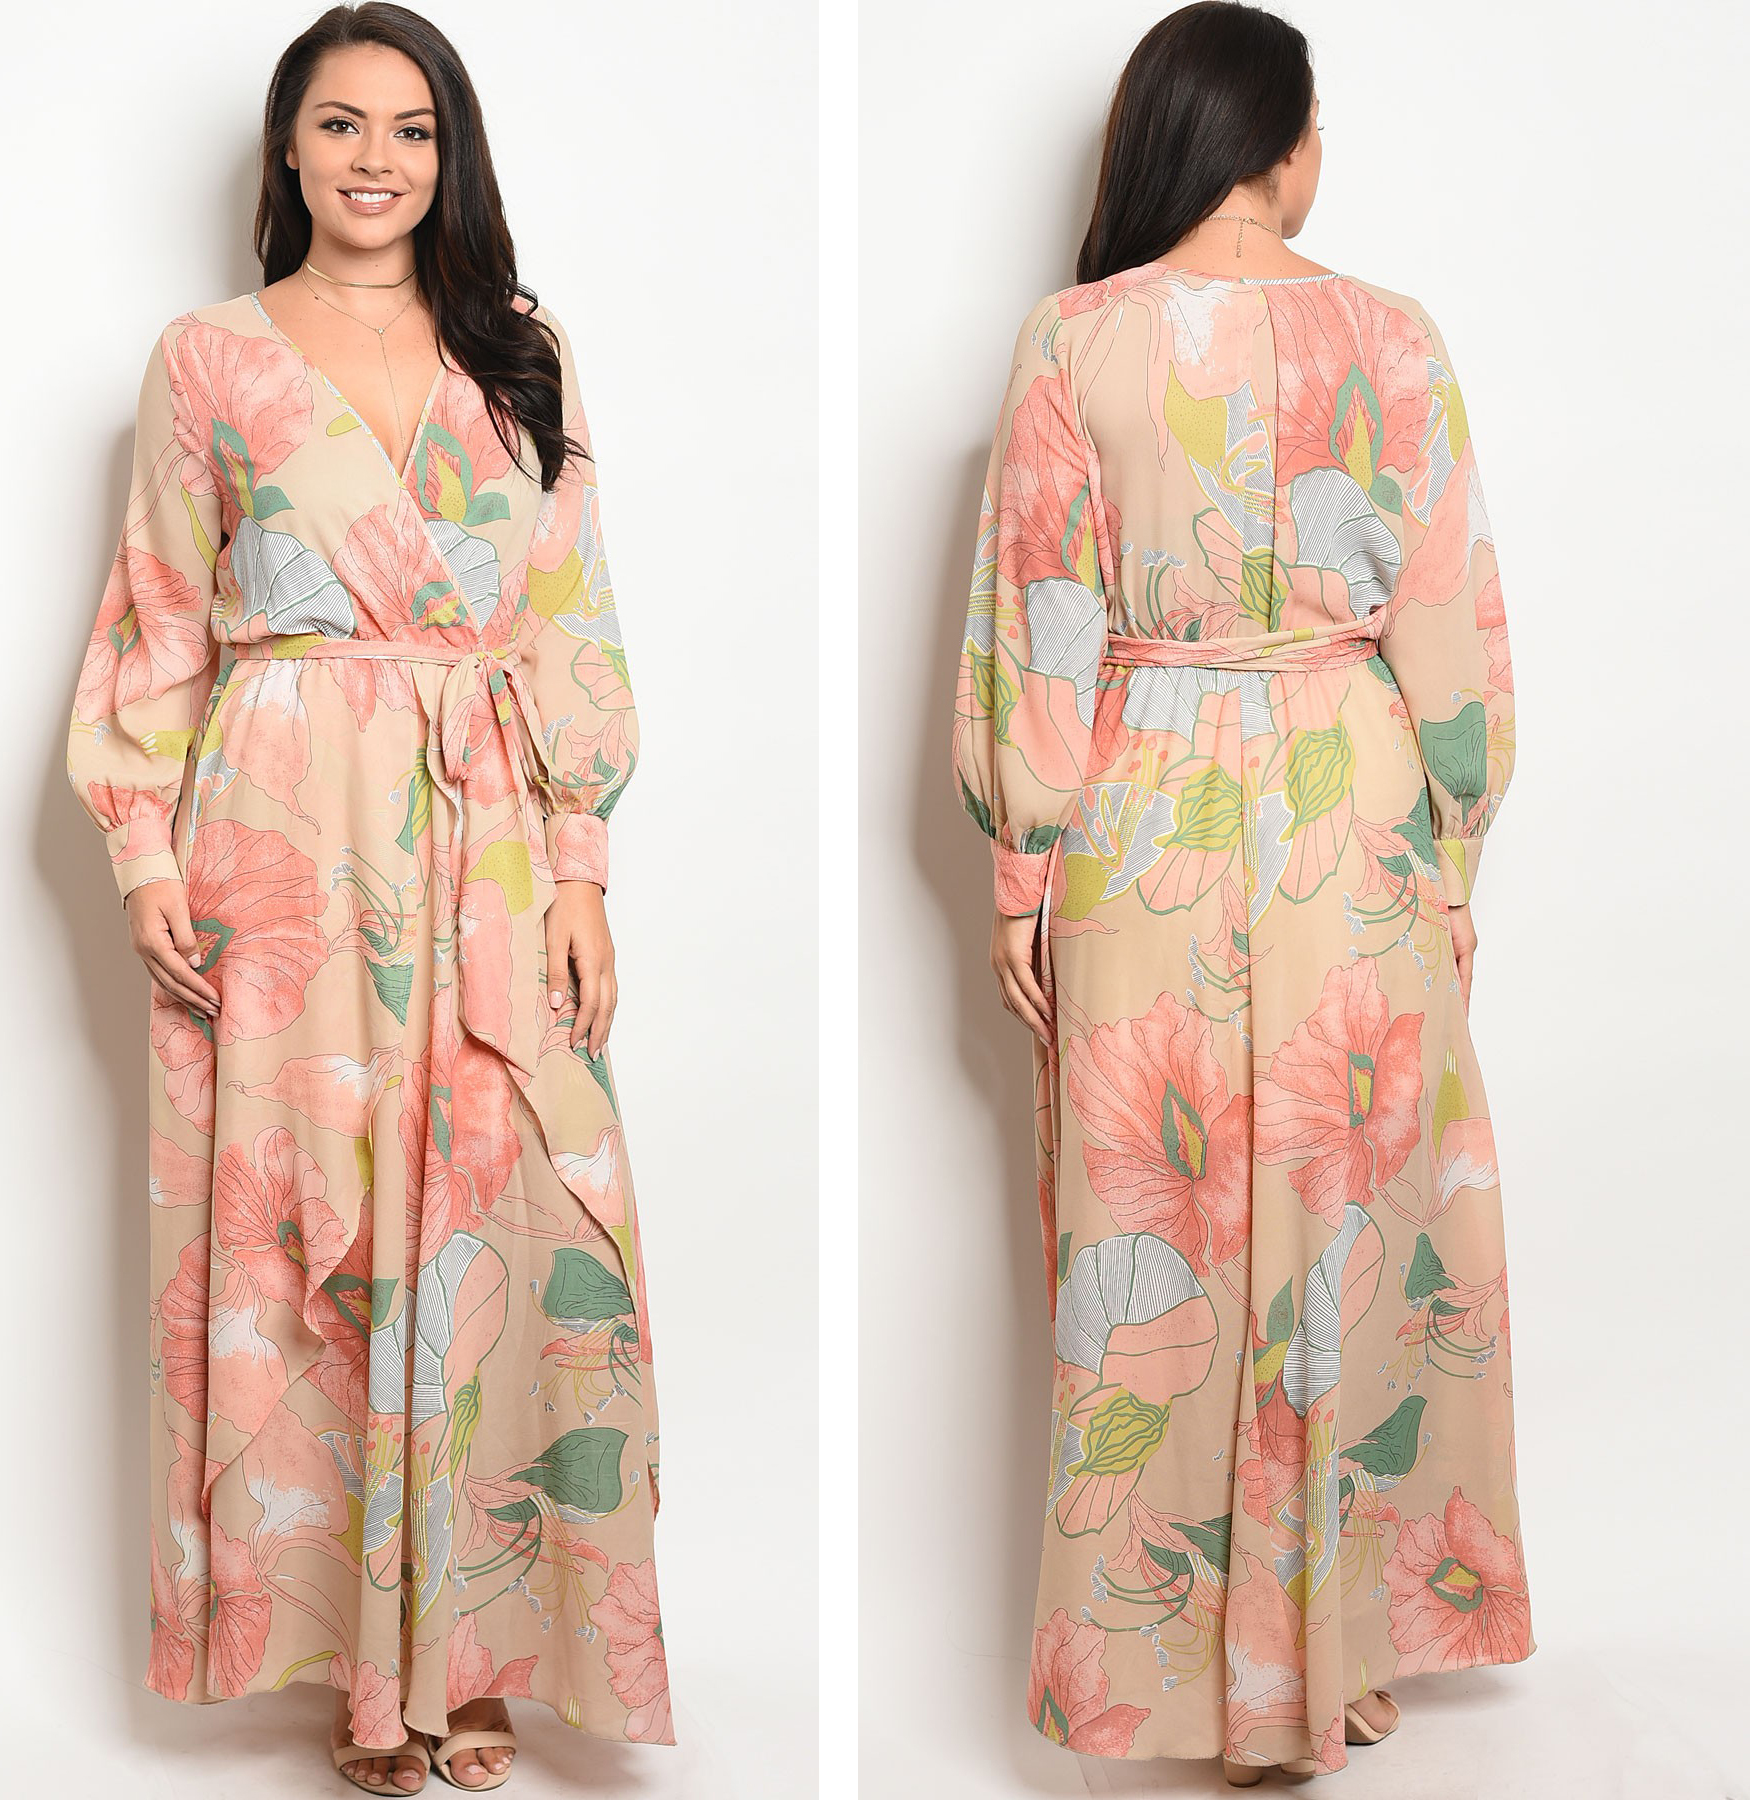 e6ca20e6b98 Floral Chiffon Maxi Dress Plus Size - Gomes Weine AG